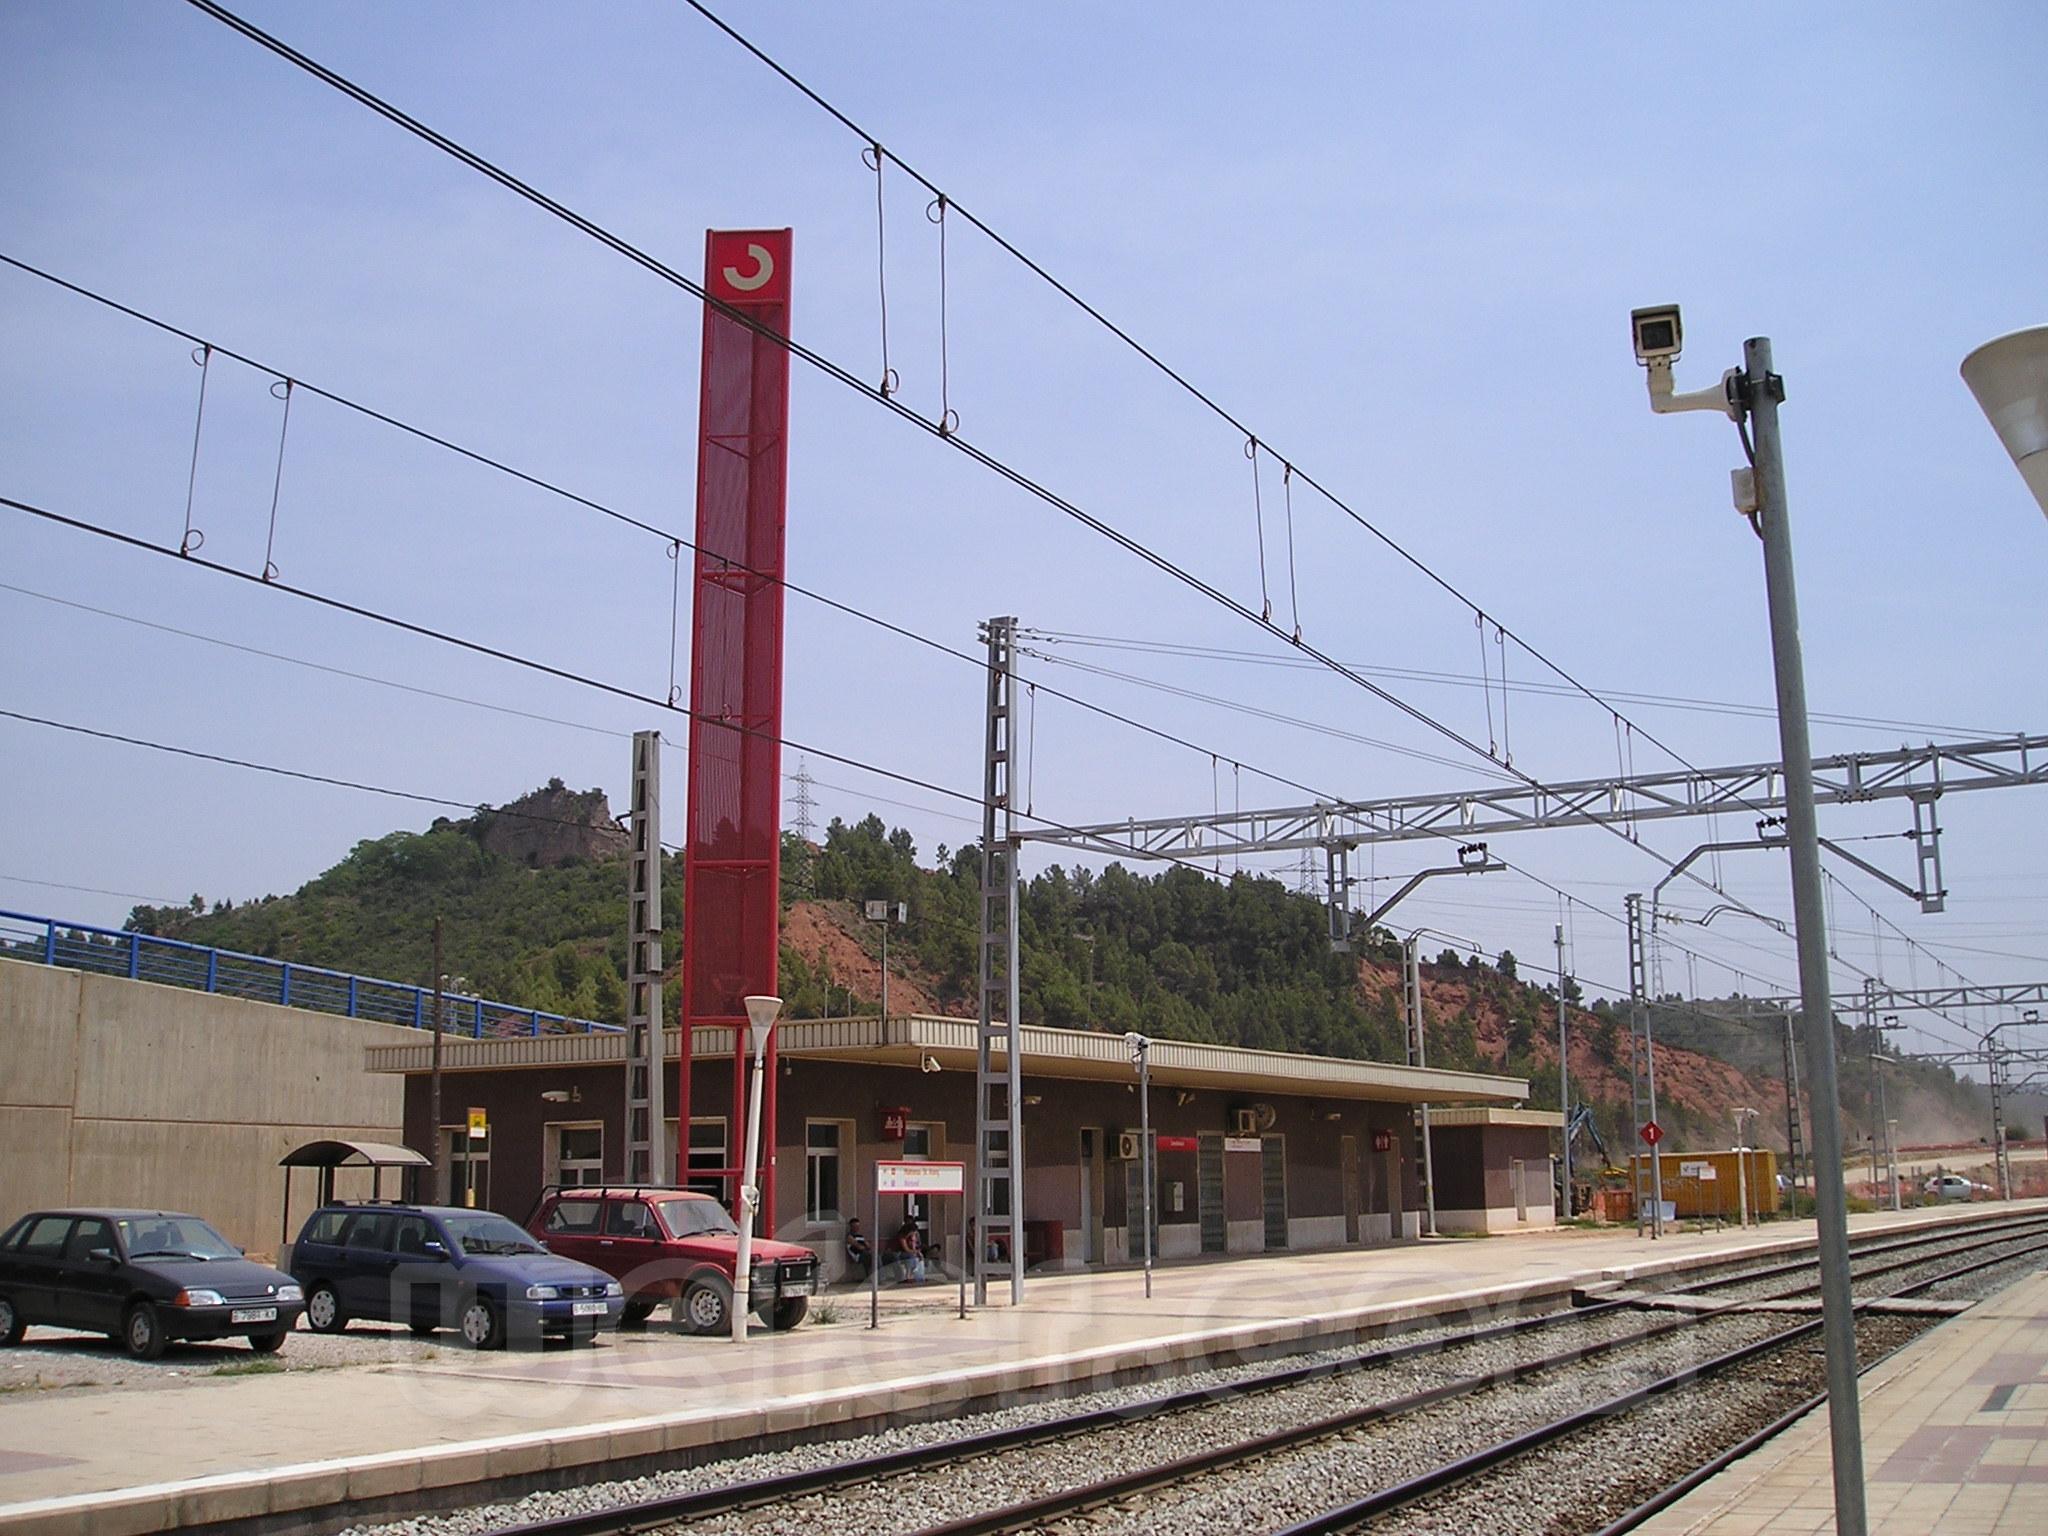 Renfe / ADIF: Castellbisbal